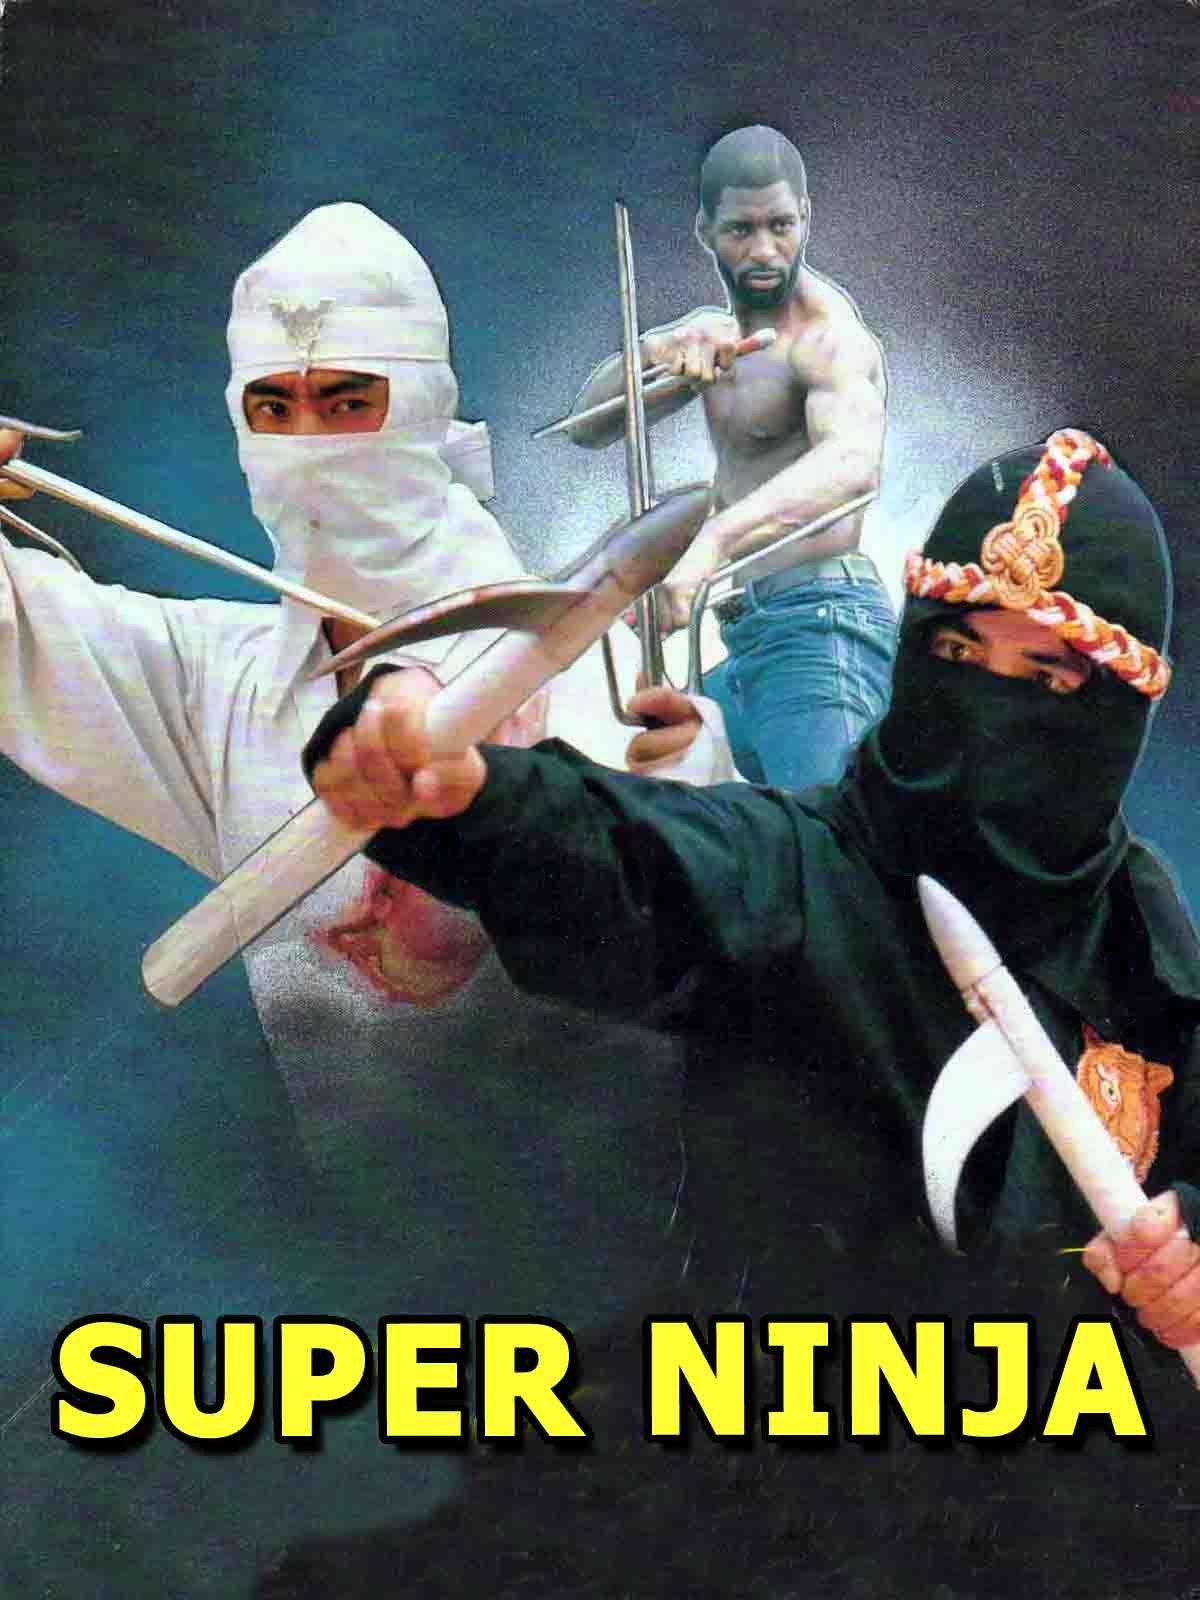 Watch Super Ninja | Prime Video